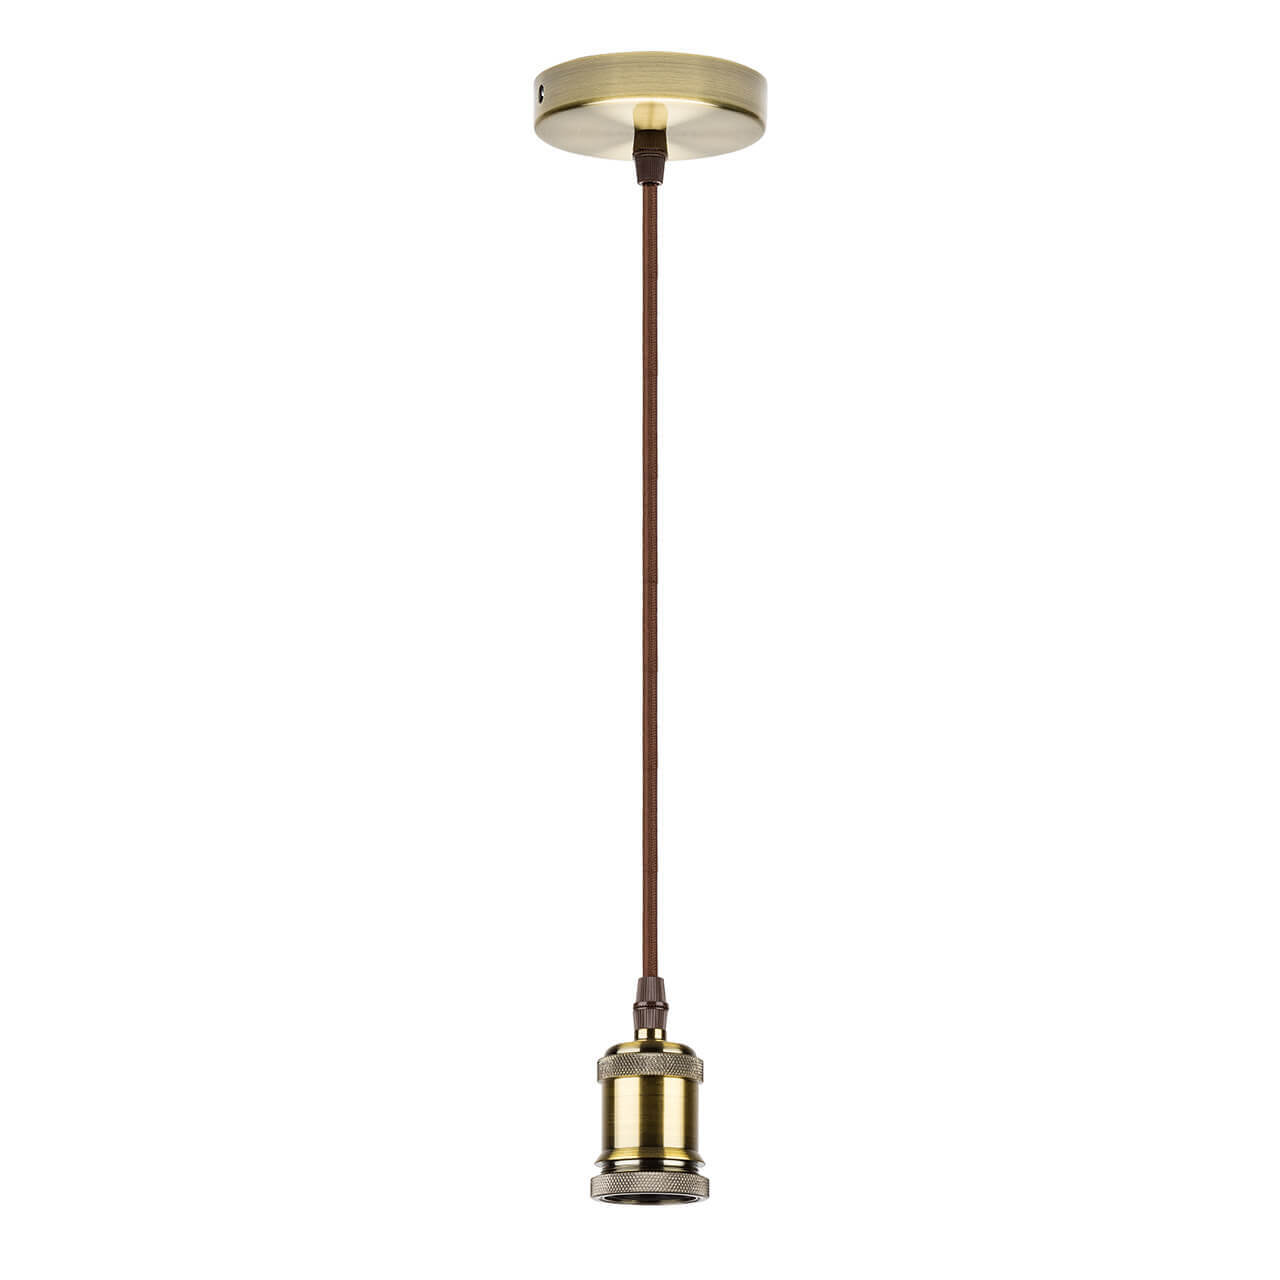 Светильник Globo A17 Suspension подвесной светильник globo new 6905 3 бронза